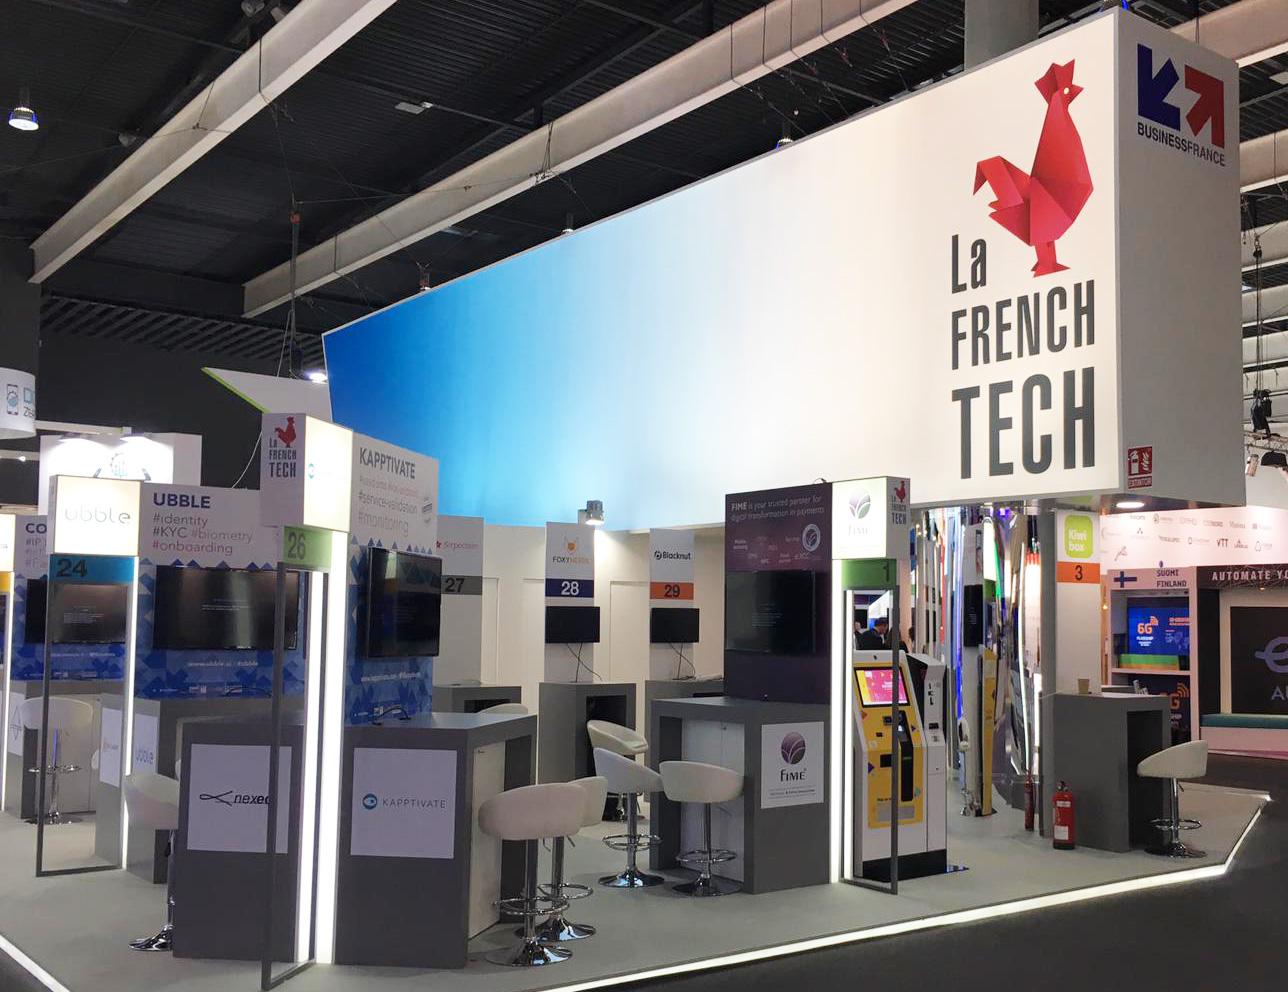 MWC19-French Tech Area-IPM France-sim card vending kiosk